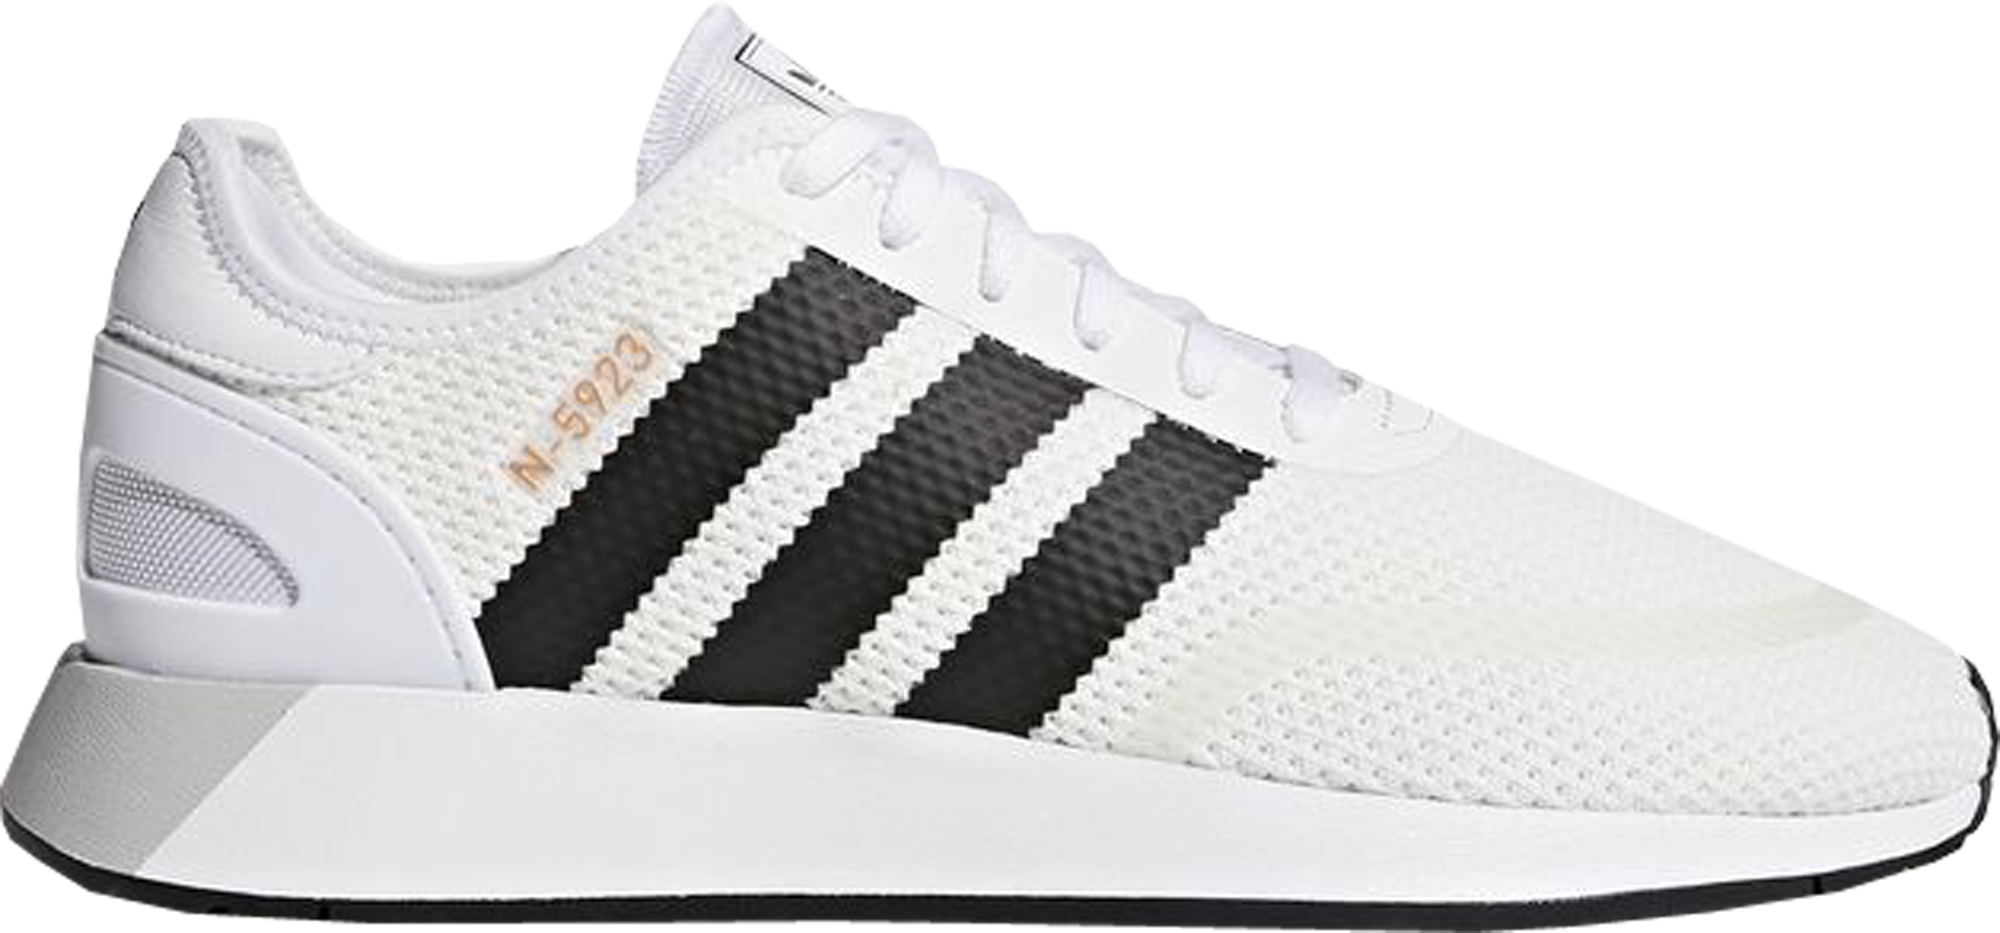 adidas N-5923 White Black